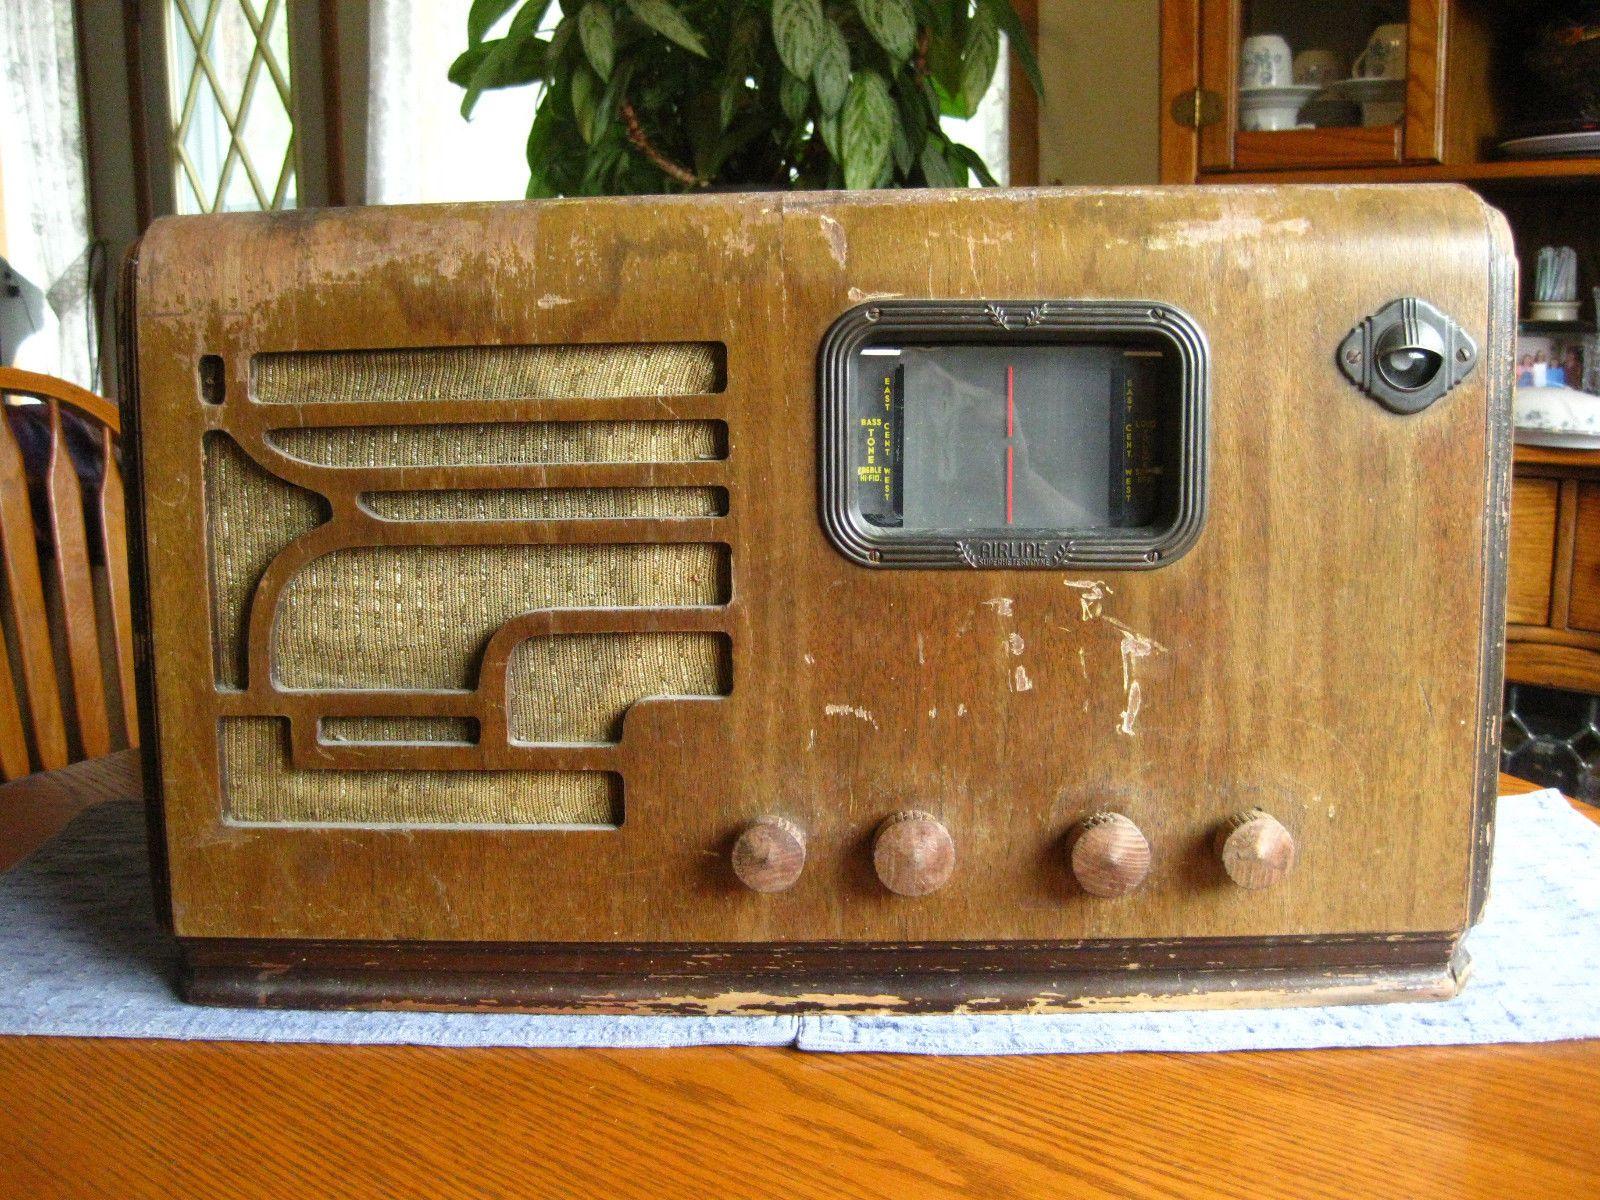 Old Antique Wood Airline Movie Dial 8 Tube Radio 62 418 Partsrestore Eye Antique Radio How To Antique Wood Vintage Radio